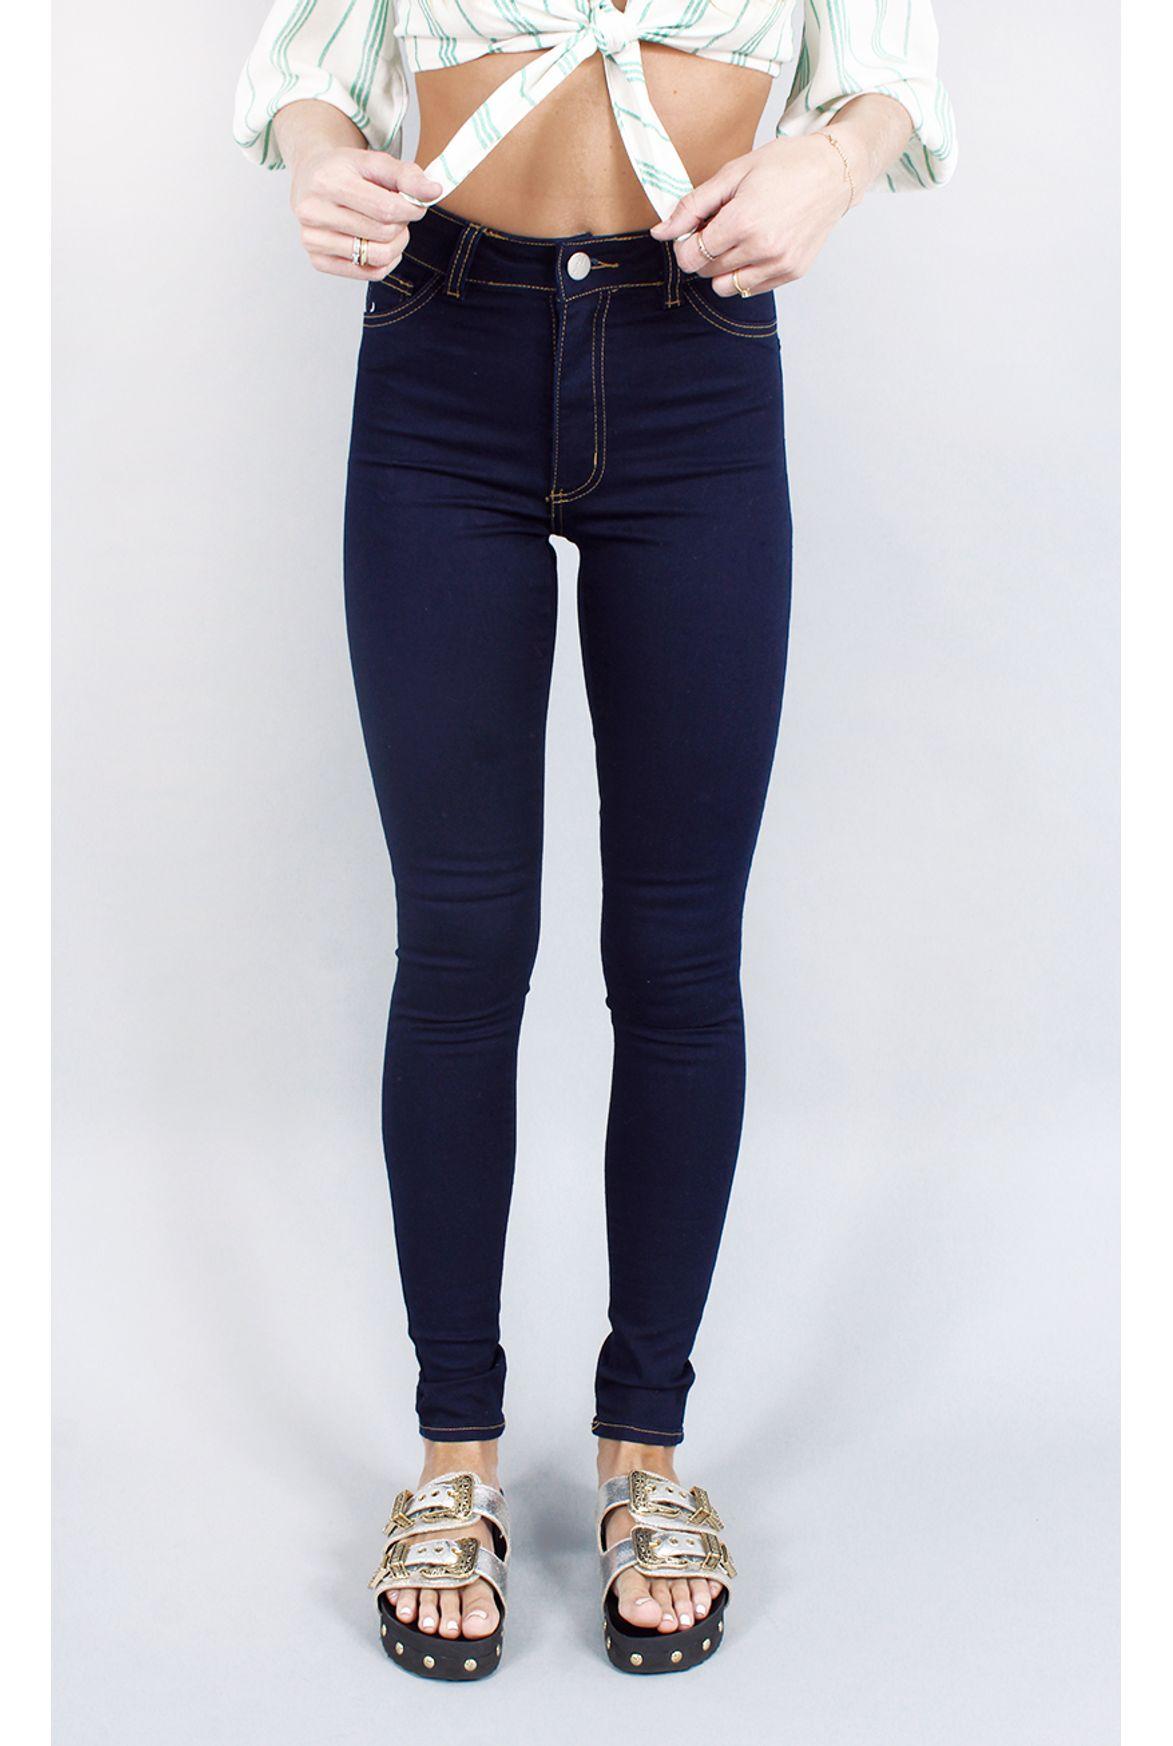 9fa6c173b11 FSHN calça cintura alta dark jeans azul - Fashion Closet